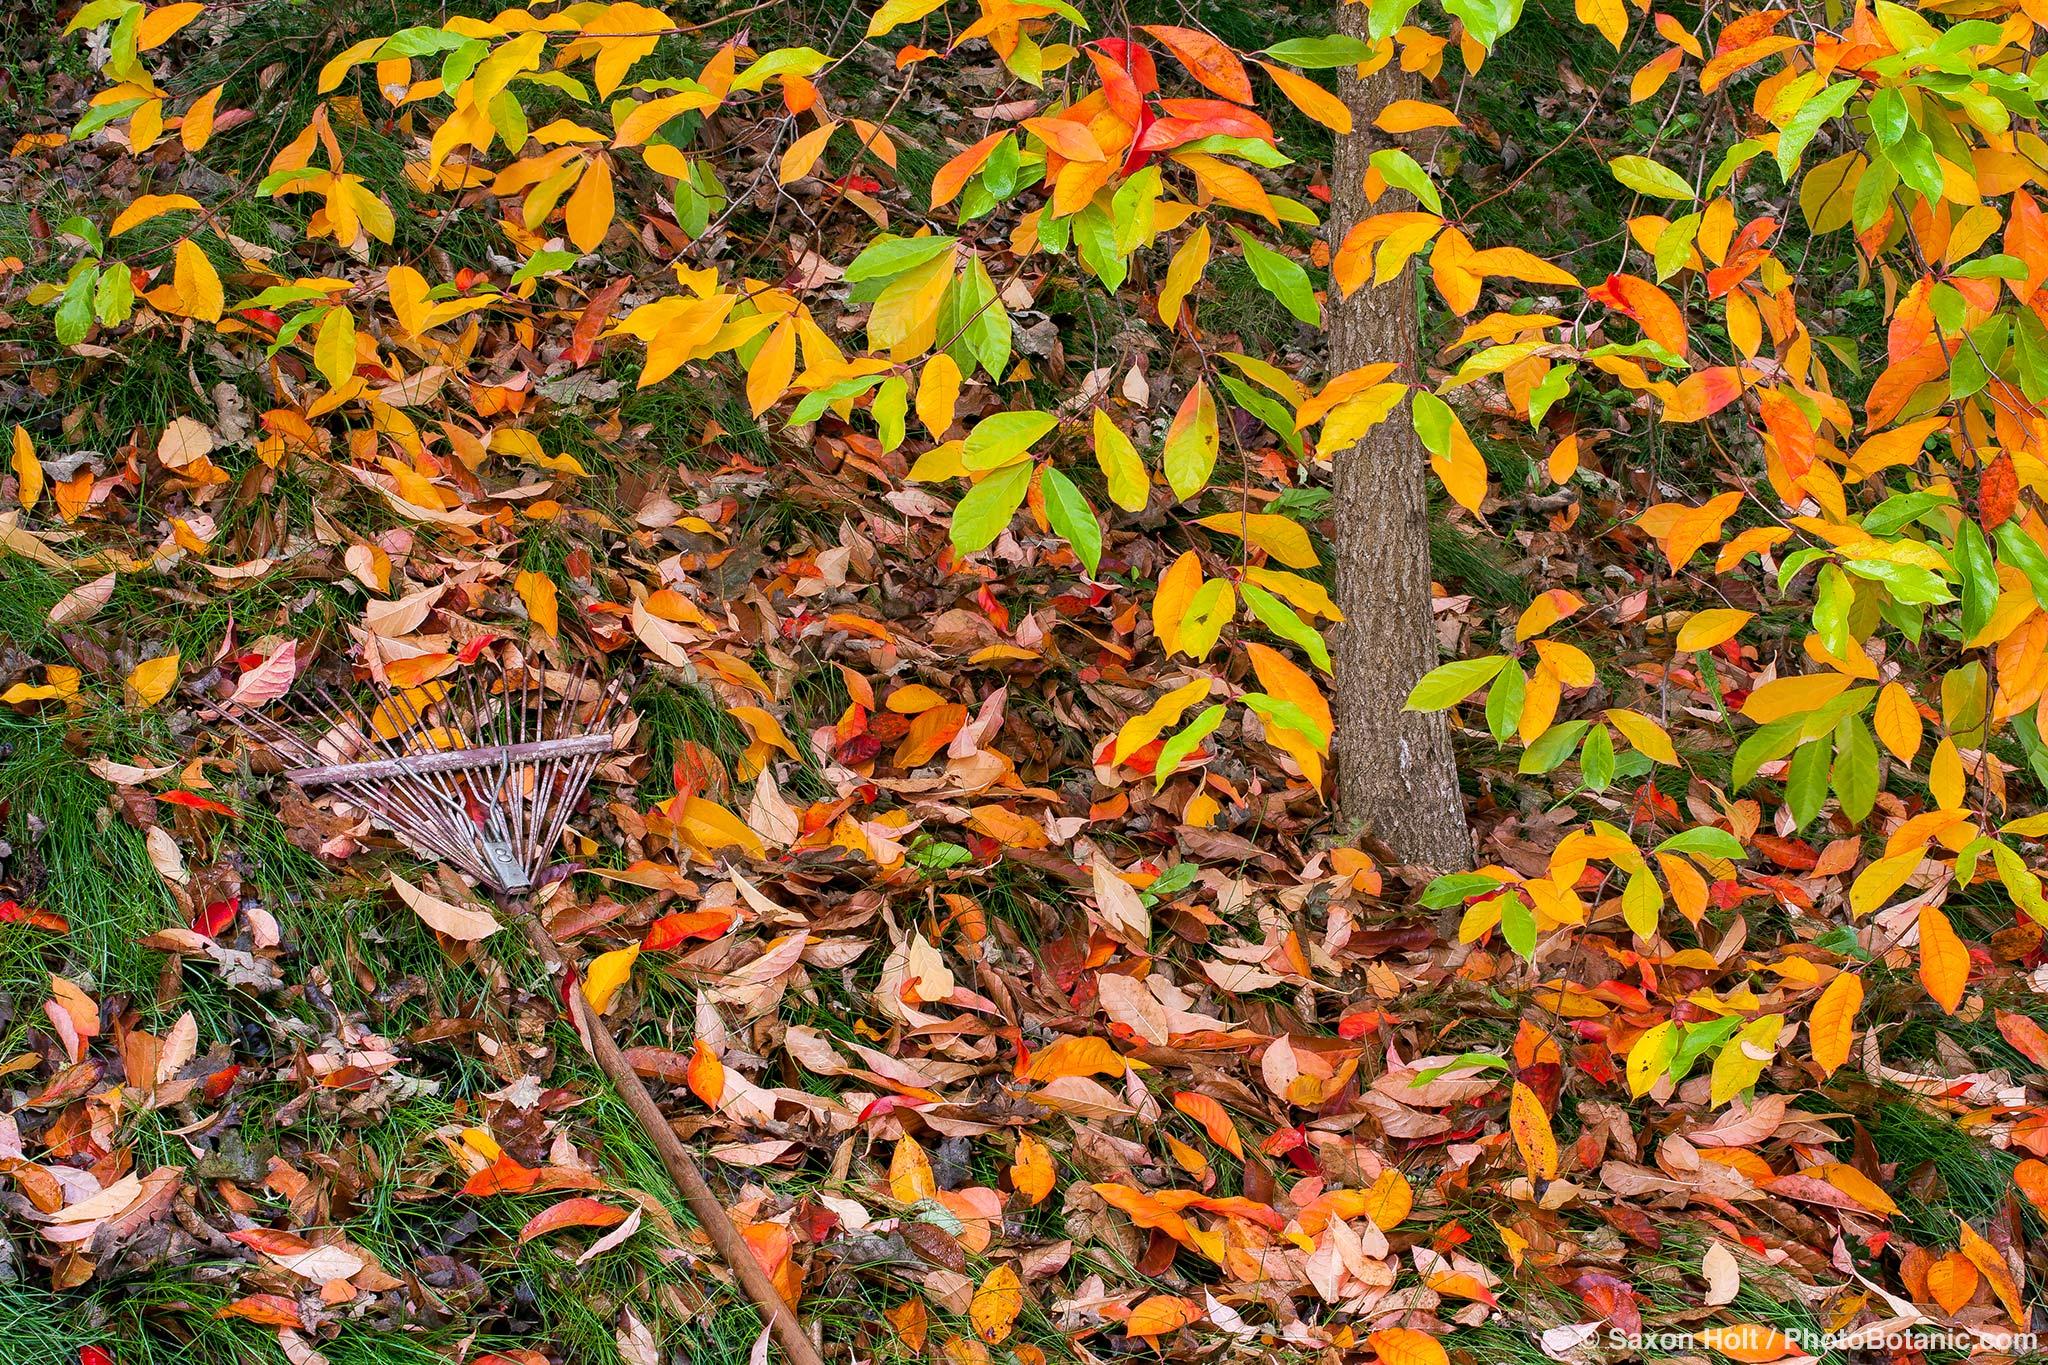 Rake in the fall leaf foliage, tupelo tree (Nyssa sylvatica) in California garden